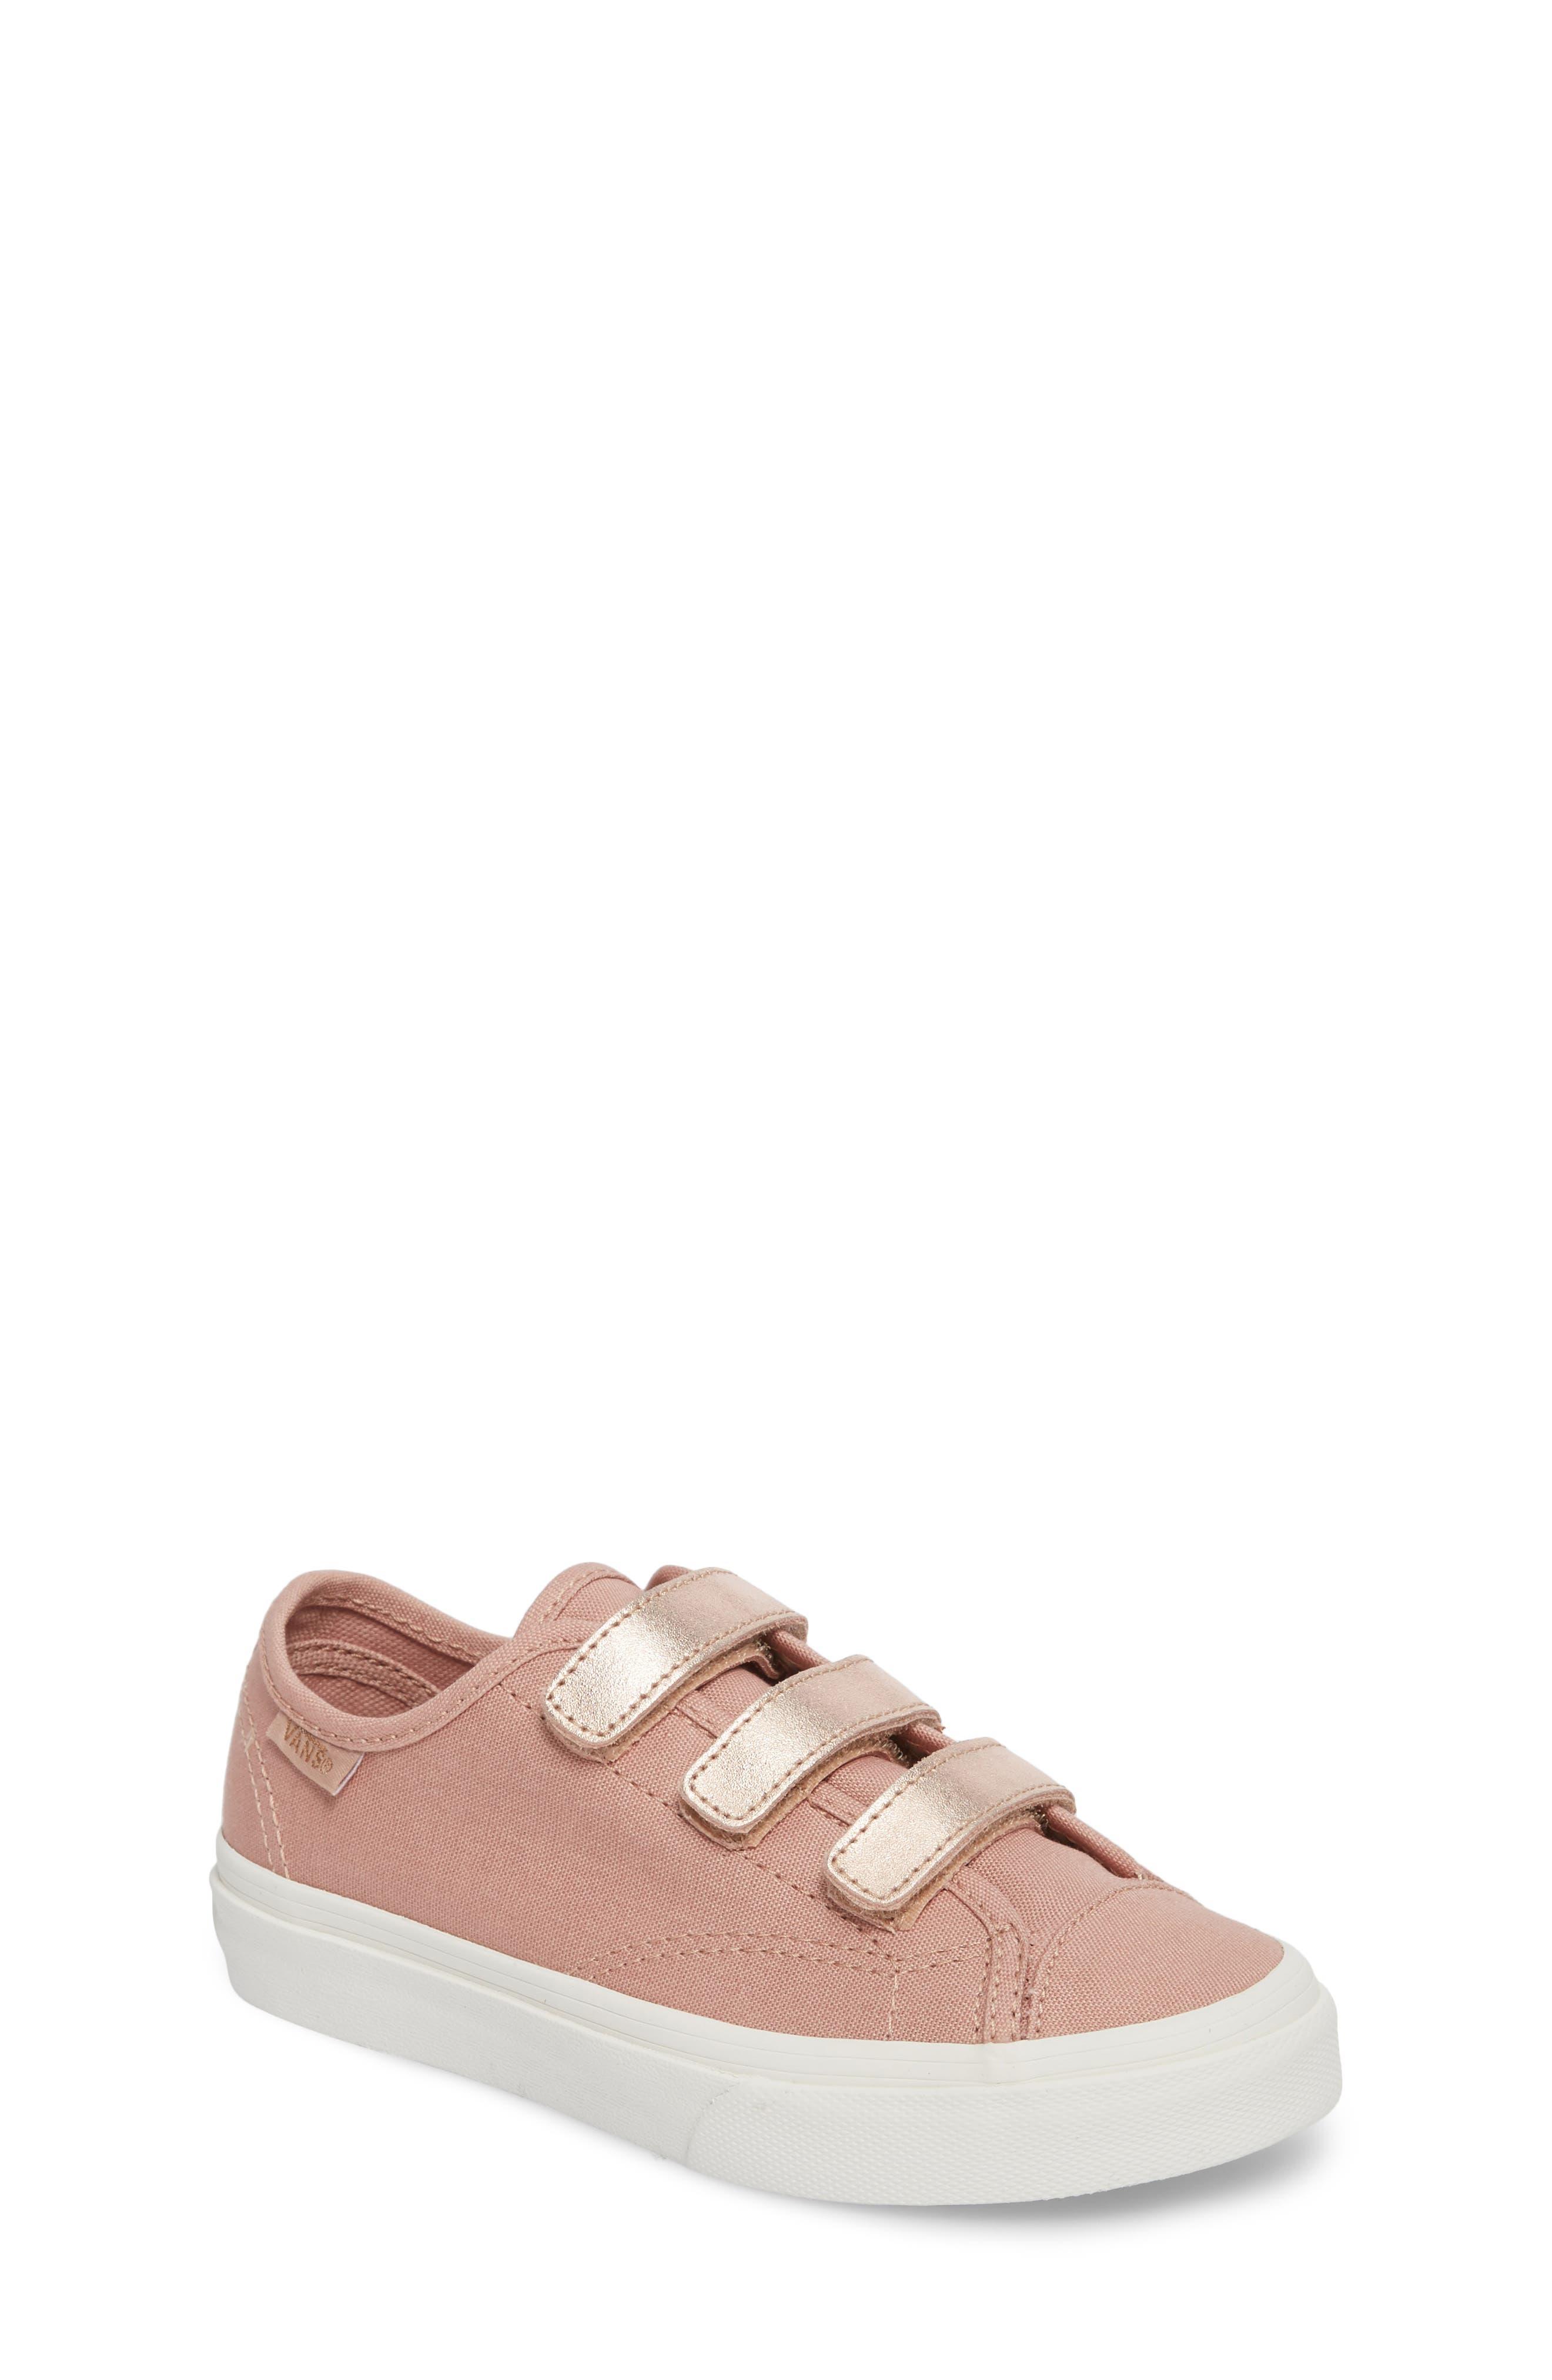 Style 23V Sneaker,                         Main,                         color, 220